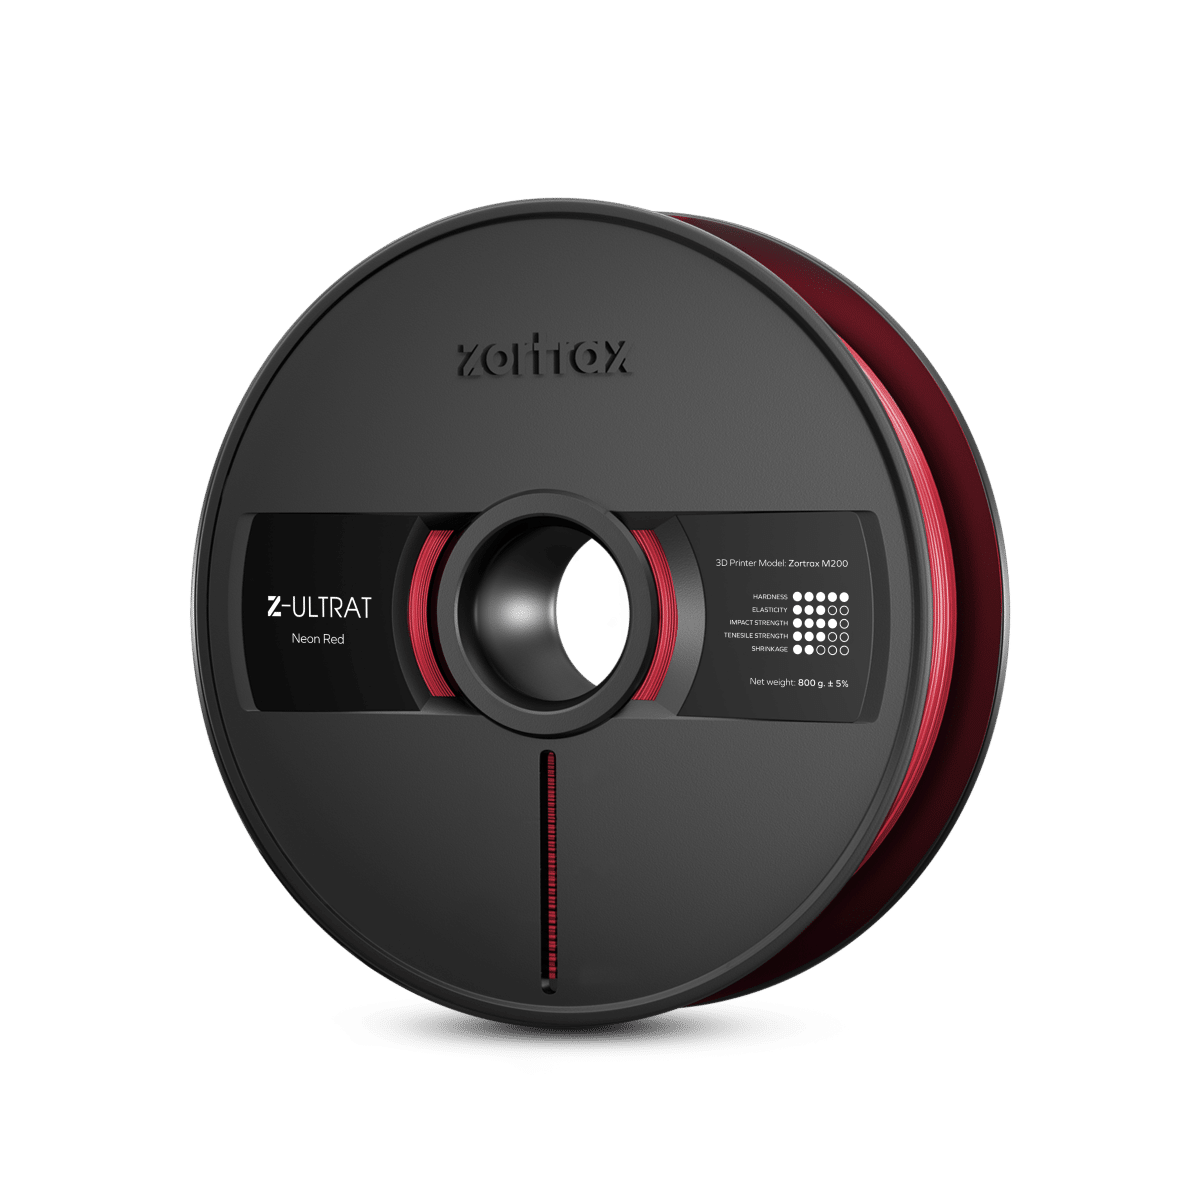 Billede af Zortrax Z-ULTRAT - 1.75mm - 800g - Neon Red